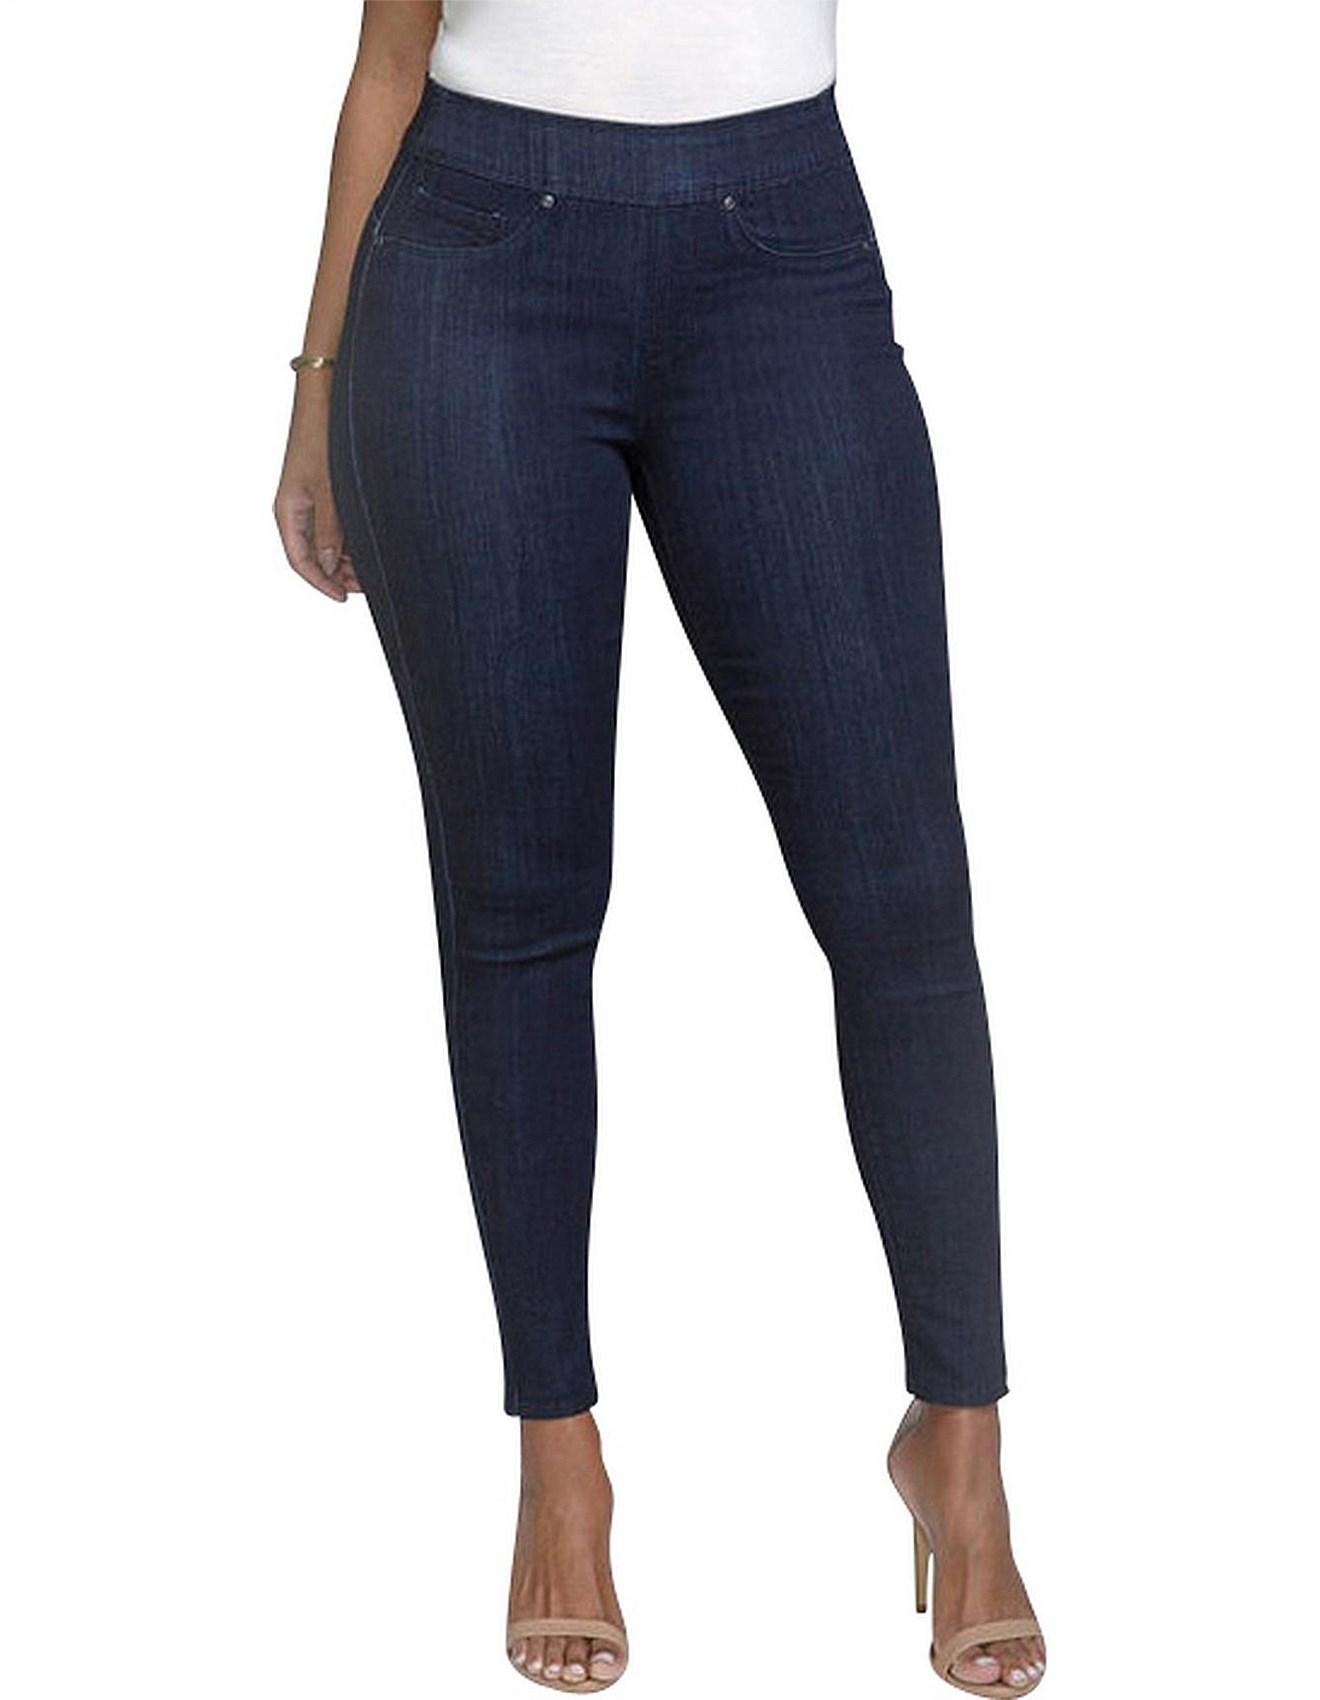 16b92dc6b2c63 Denim Jeans For Women   Women's Jeans Online   David Jones - Sculpt ...